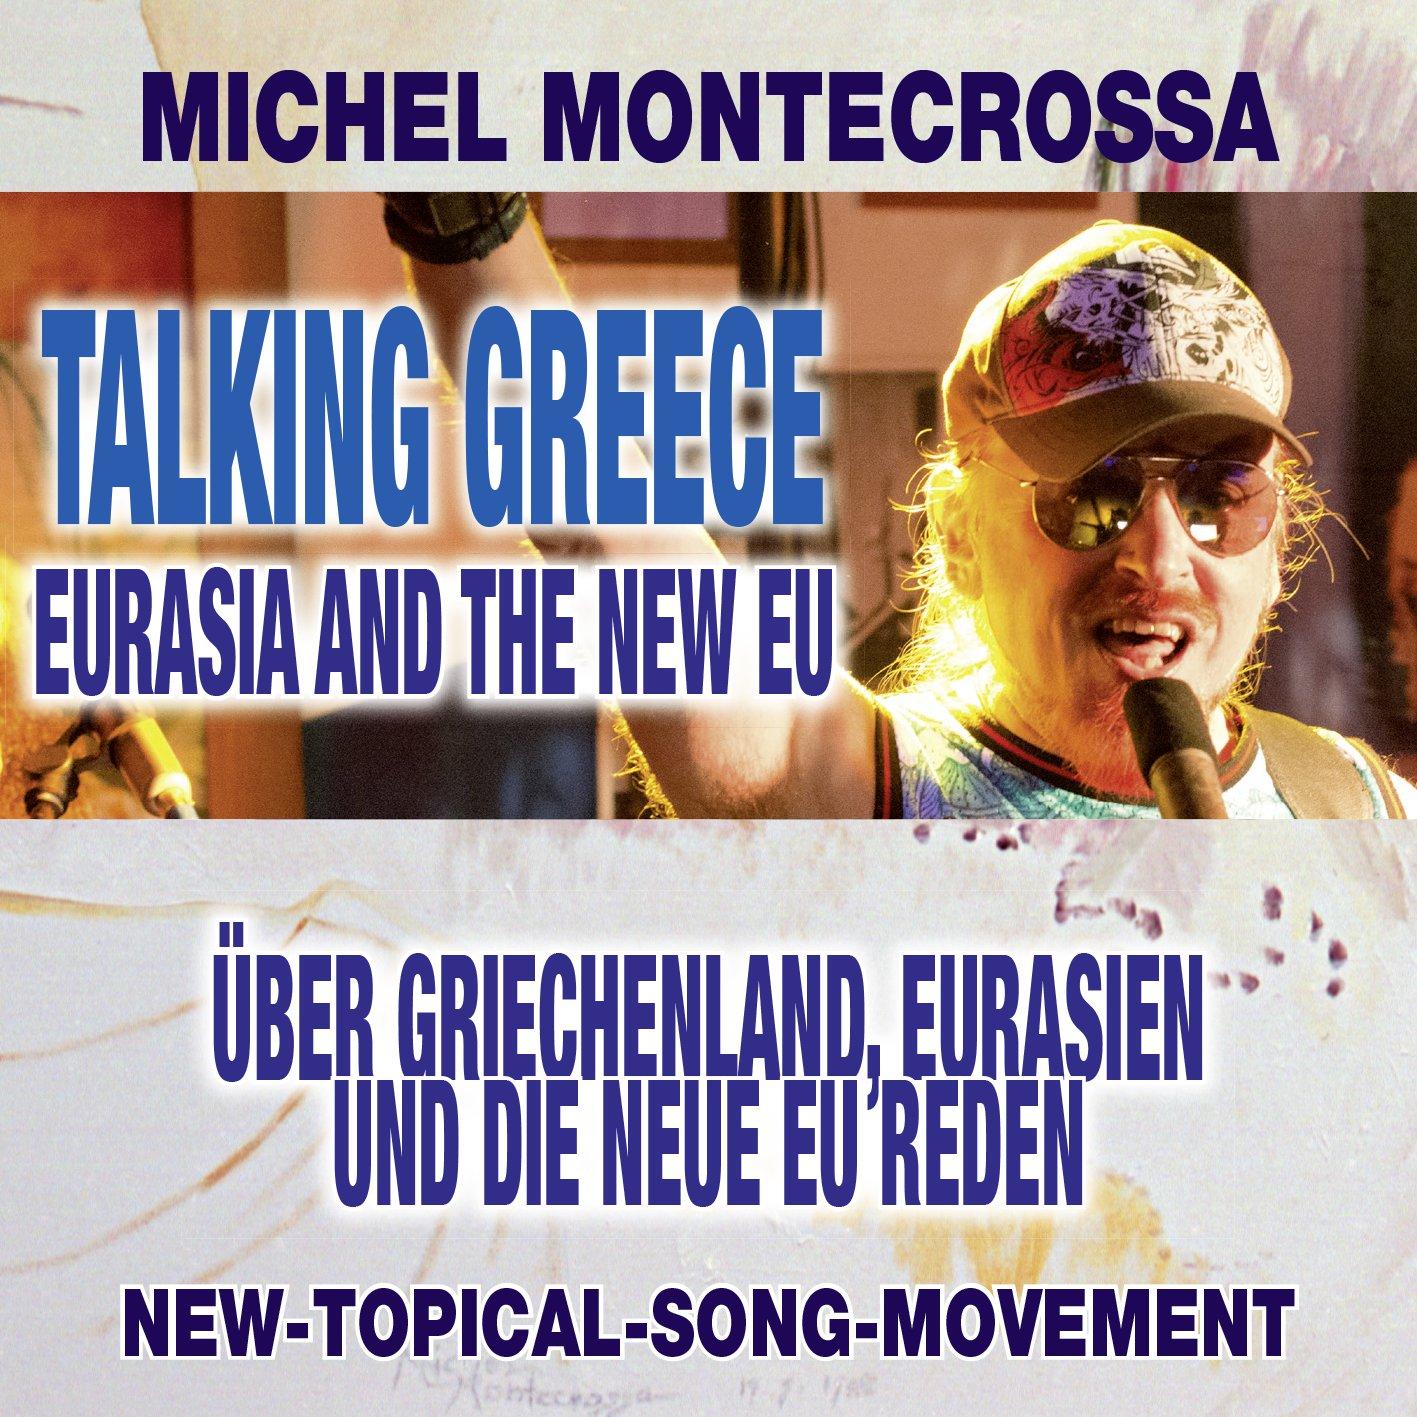 Talking Greece, Eurasia and the new EU